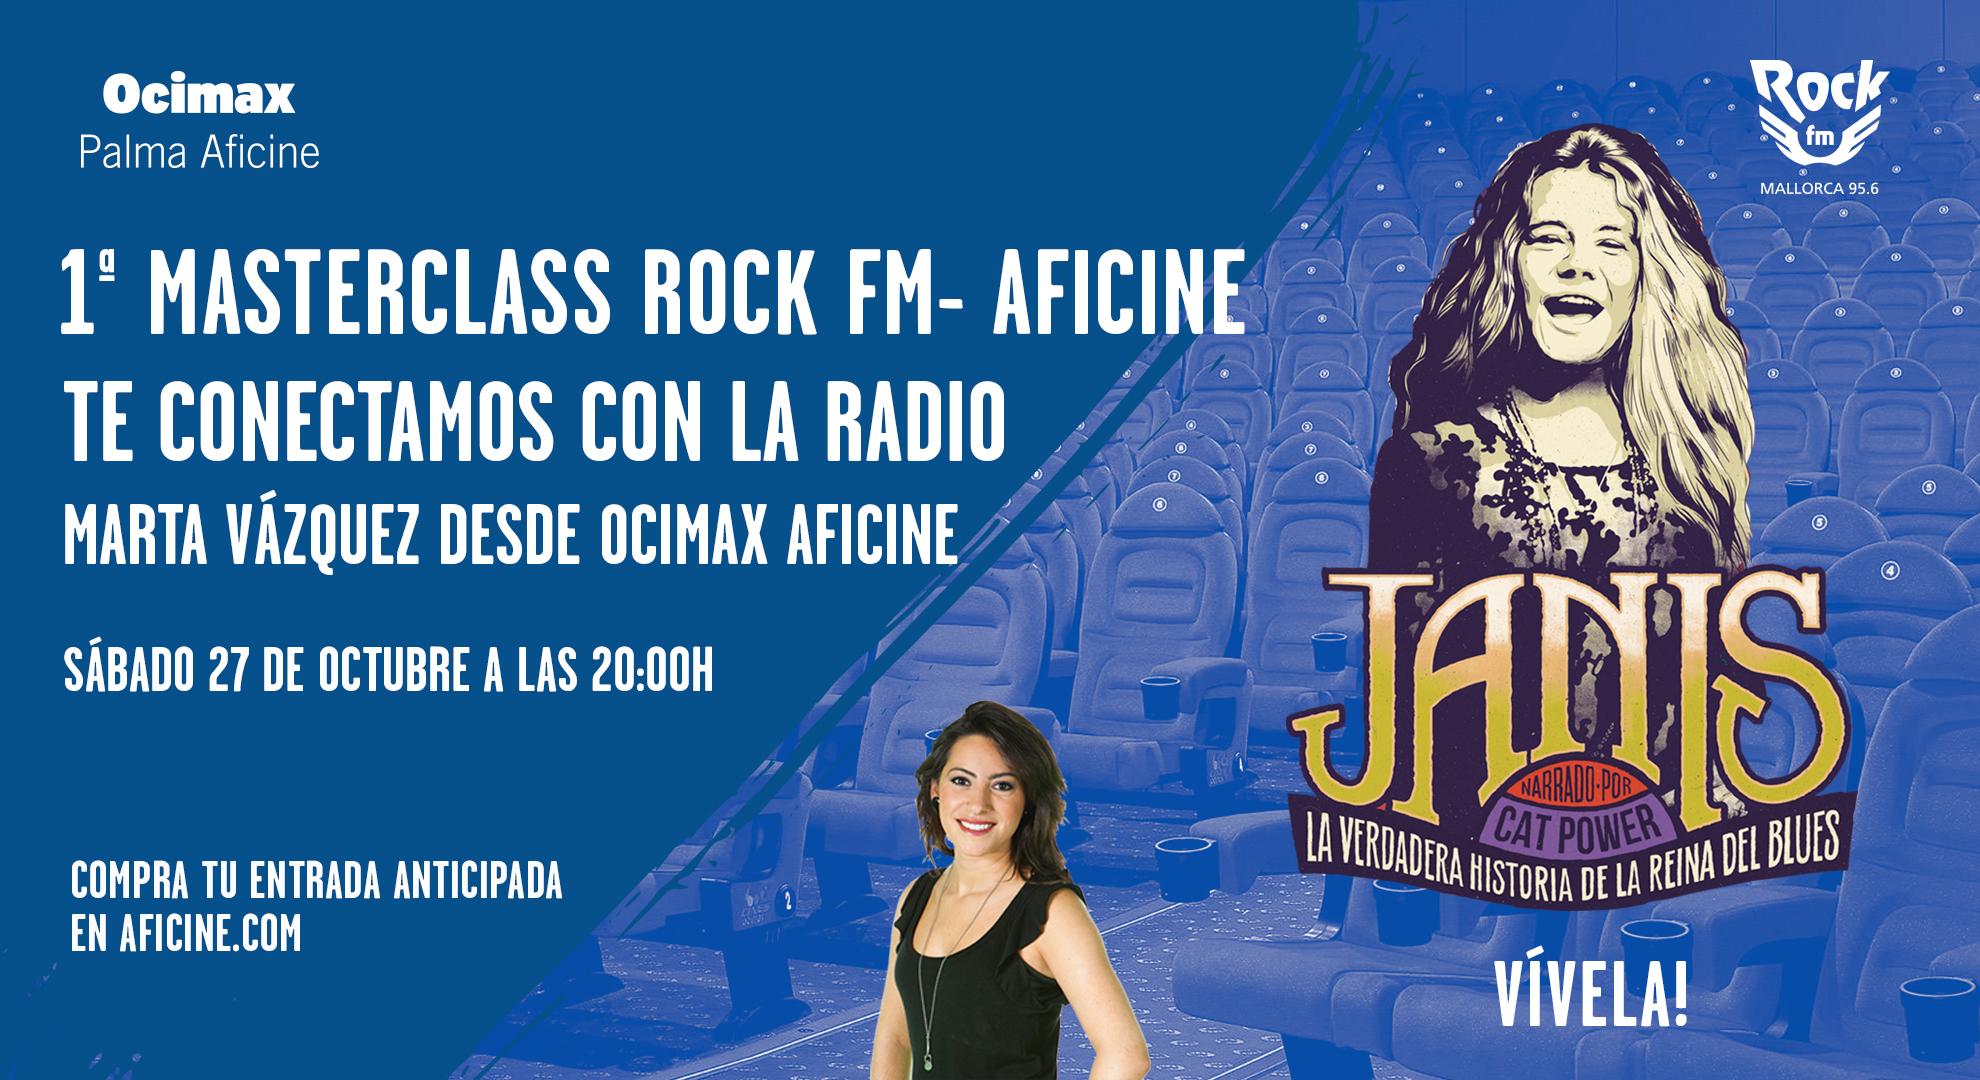 MASTERCLASS<br>ROCK FM – AFICINE LIVE MUSIC<br>Primera en España. Evento único!!